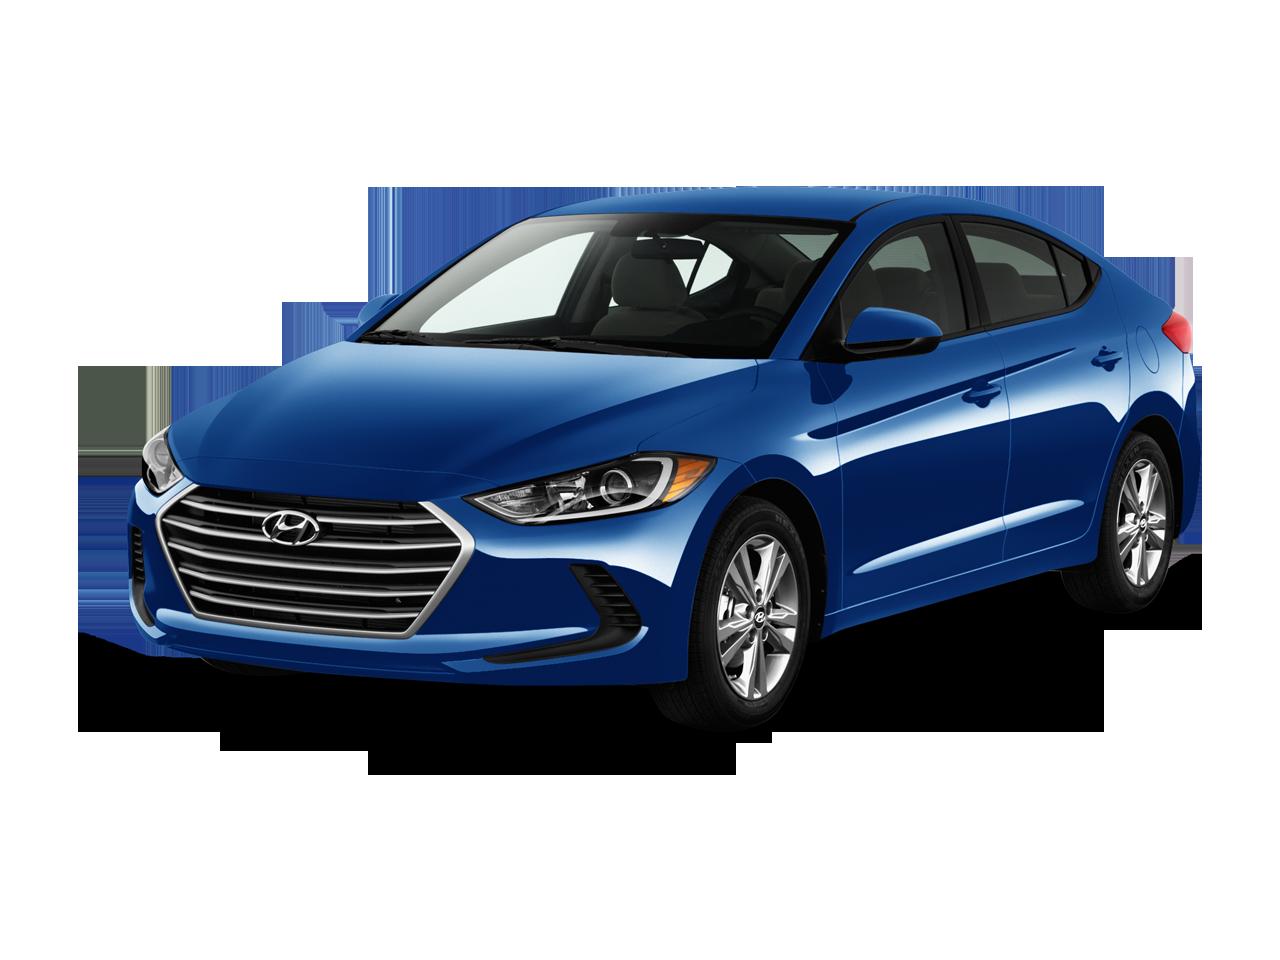 2017 Hyundai Elantra Vs Nissan Sentra Hicksville Ny